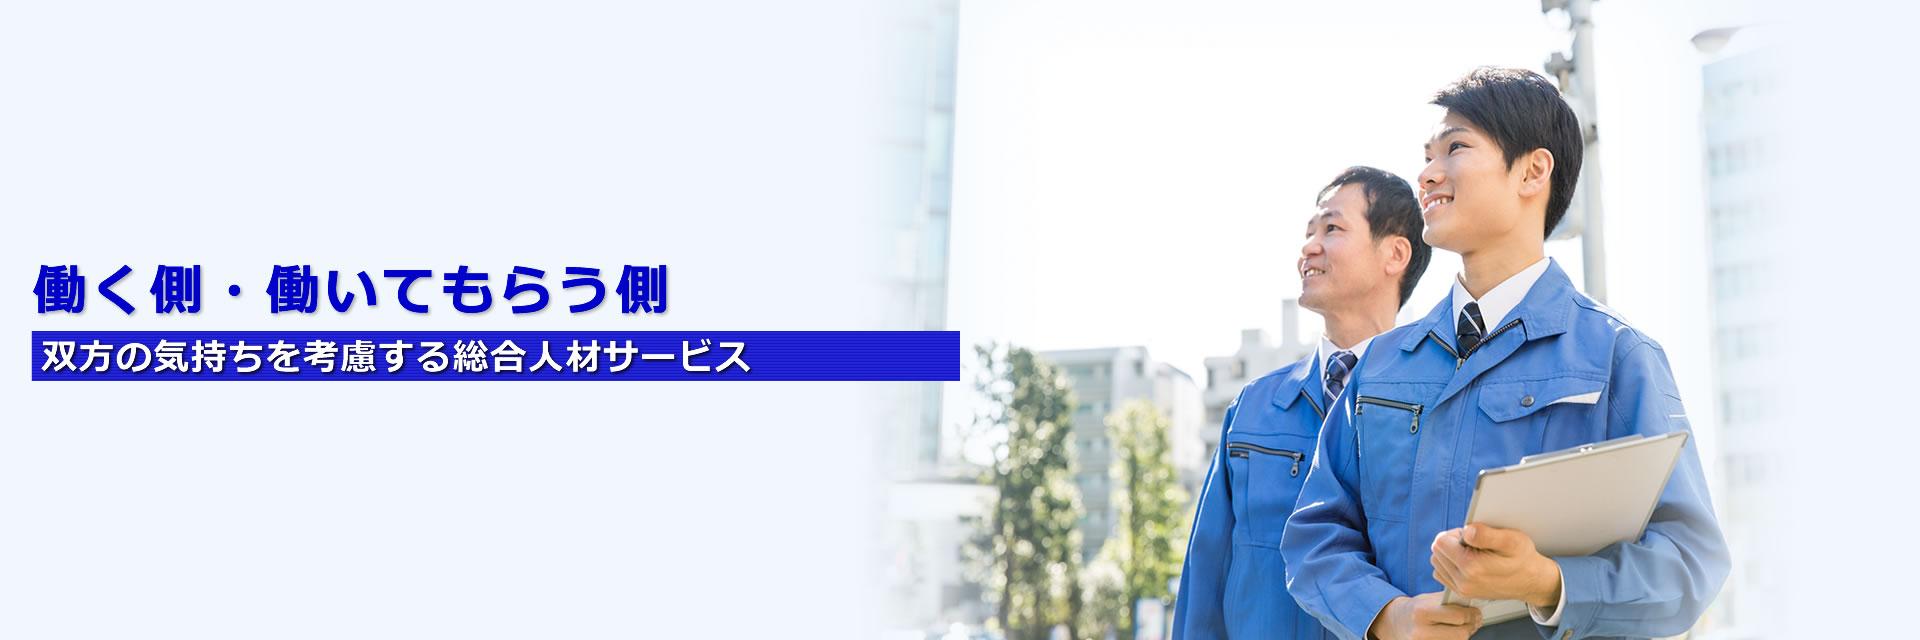 株式会社 アクティブライン/千葉県八千代市/人材派遣、人材紹介,紹介予定派遣、業務請負